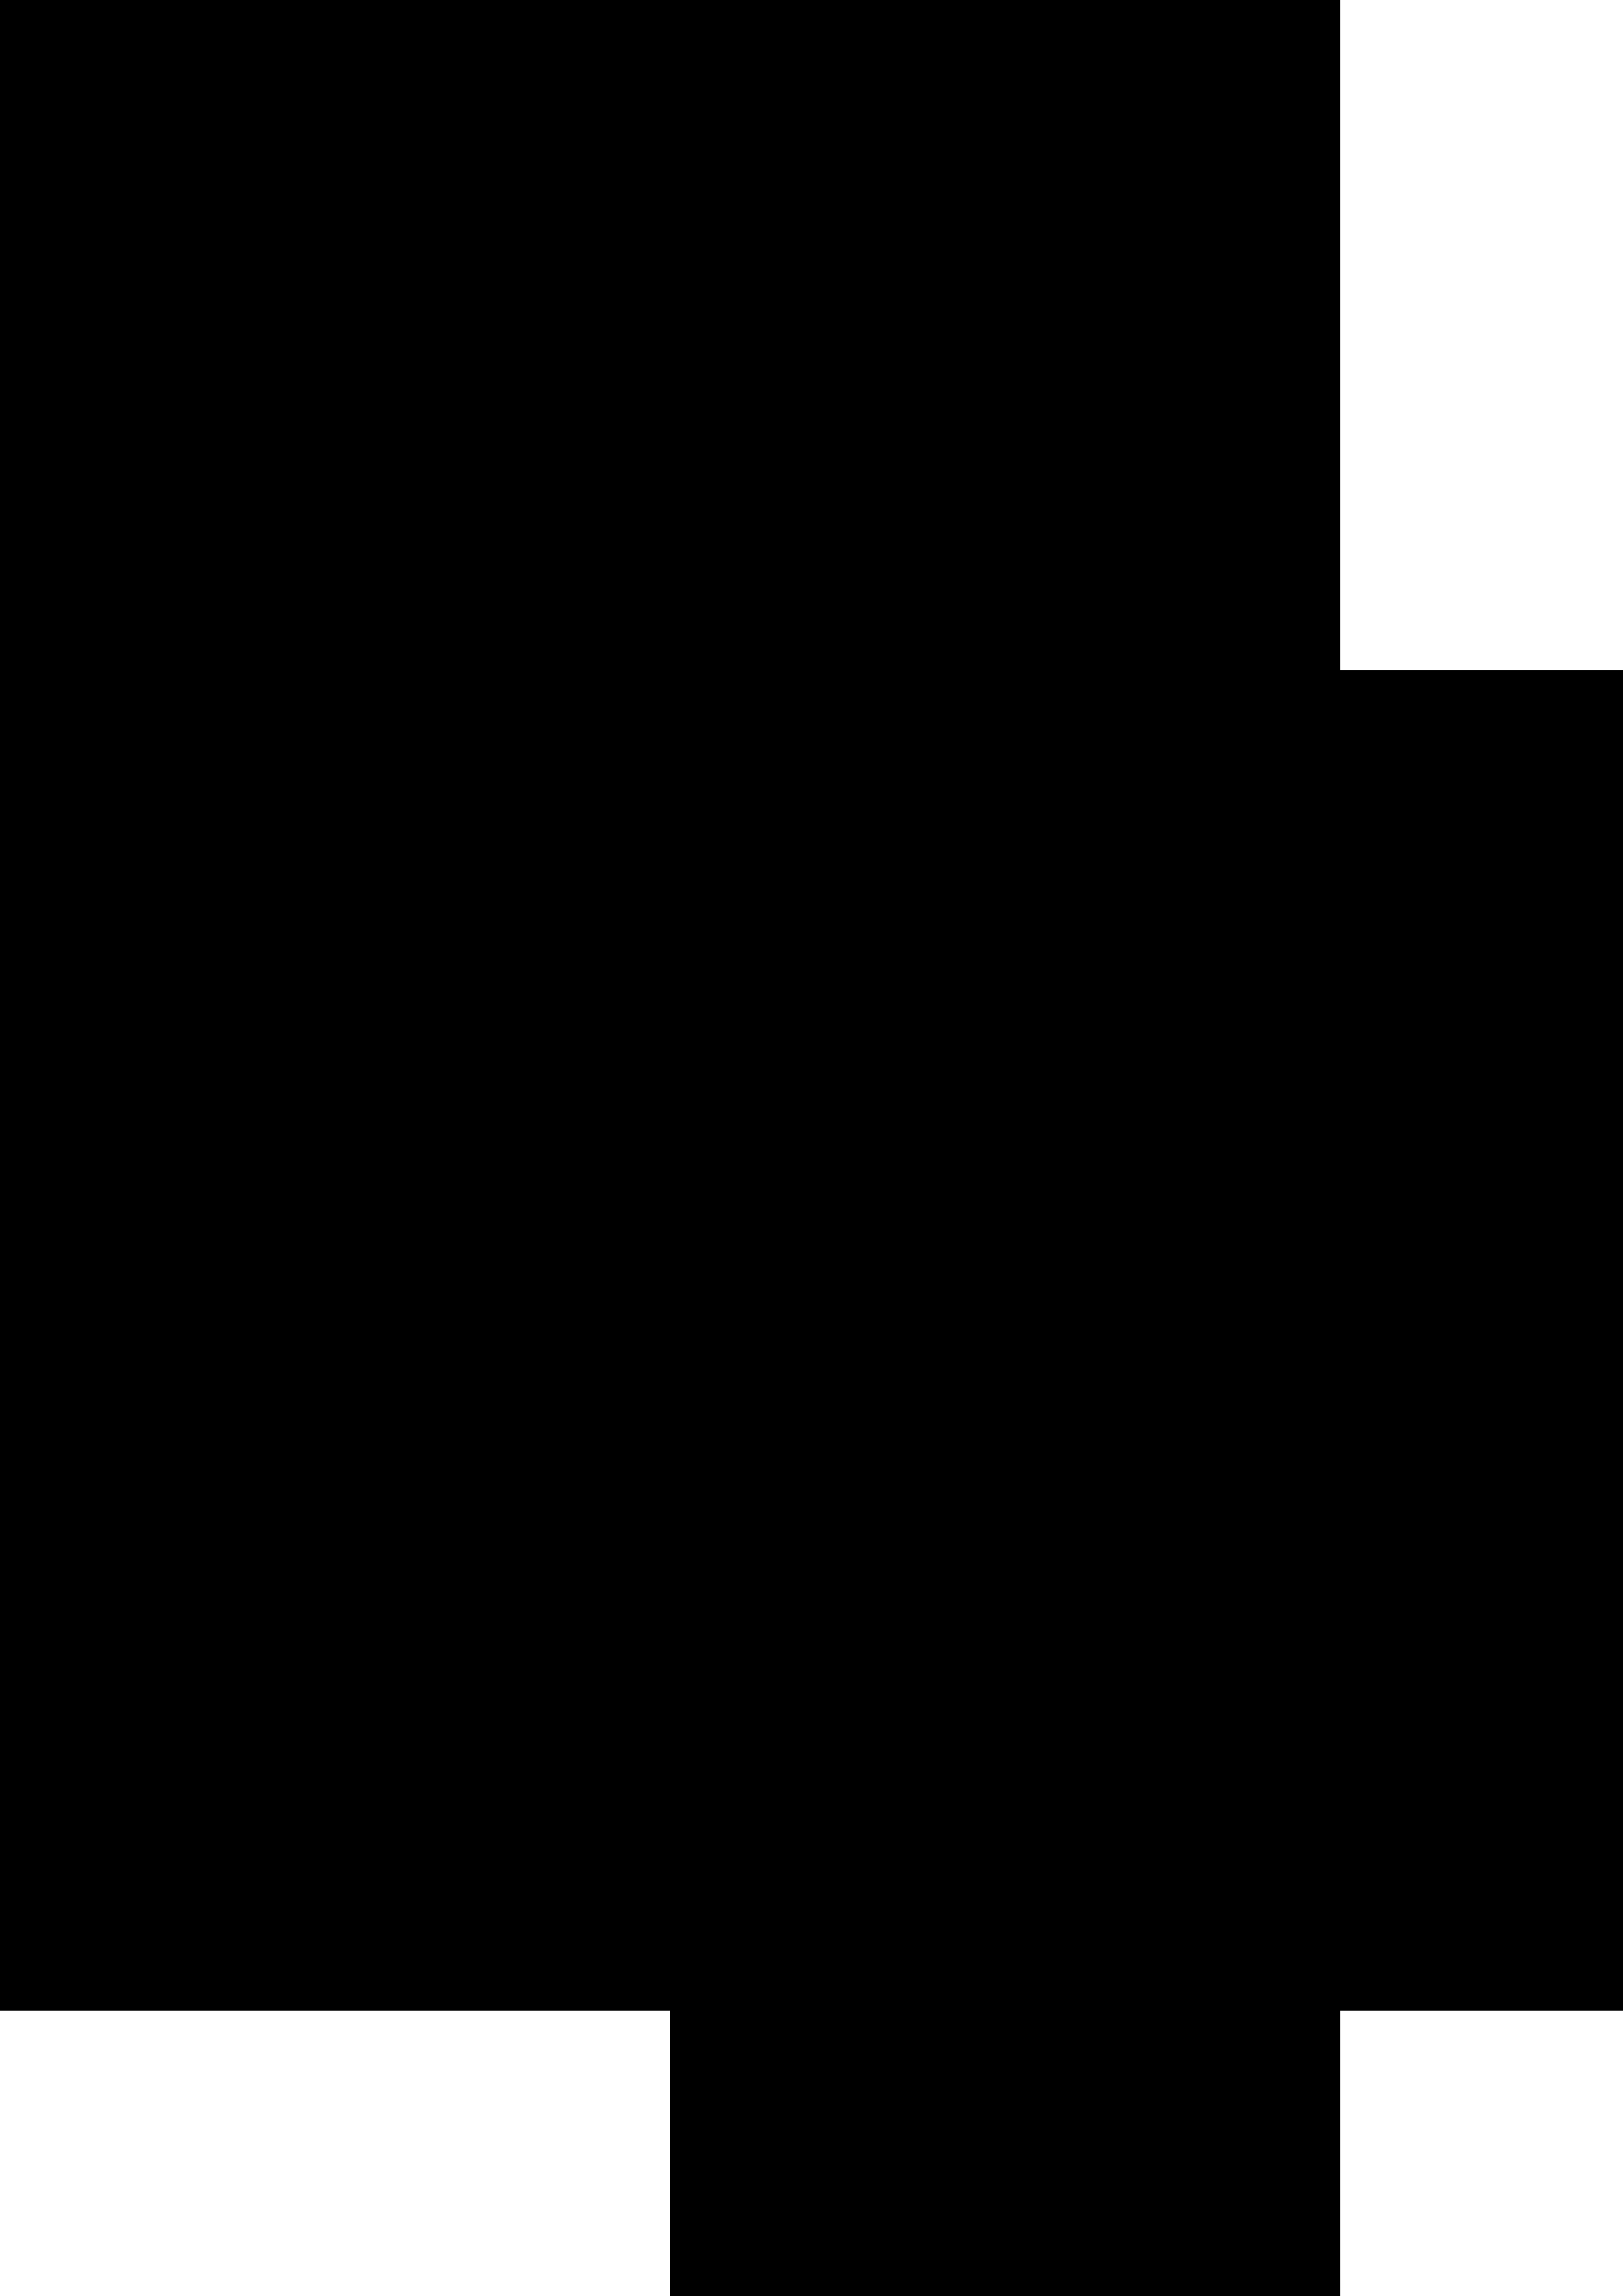 Accolade robot symbol